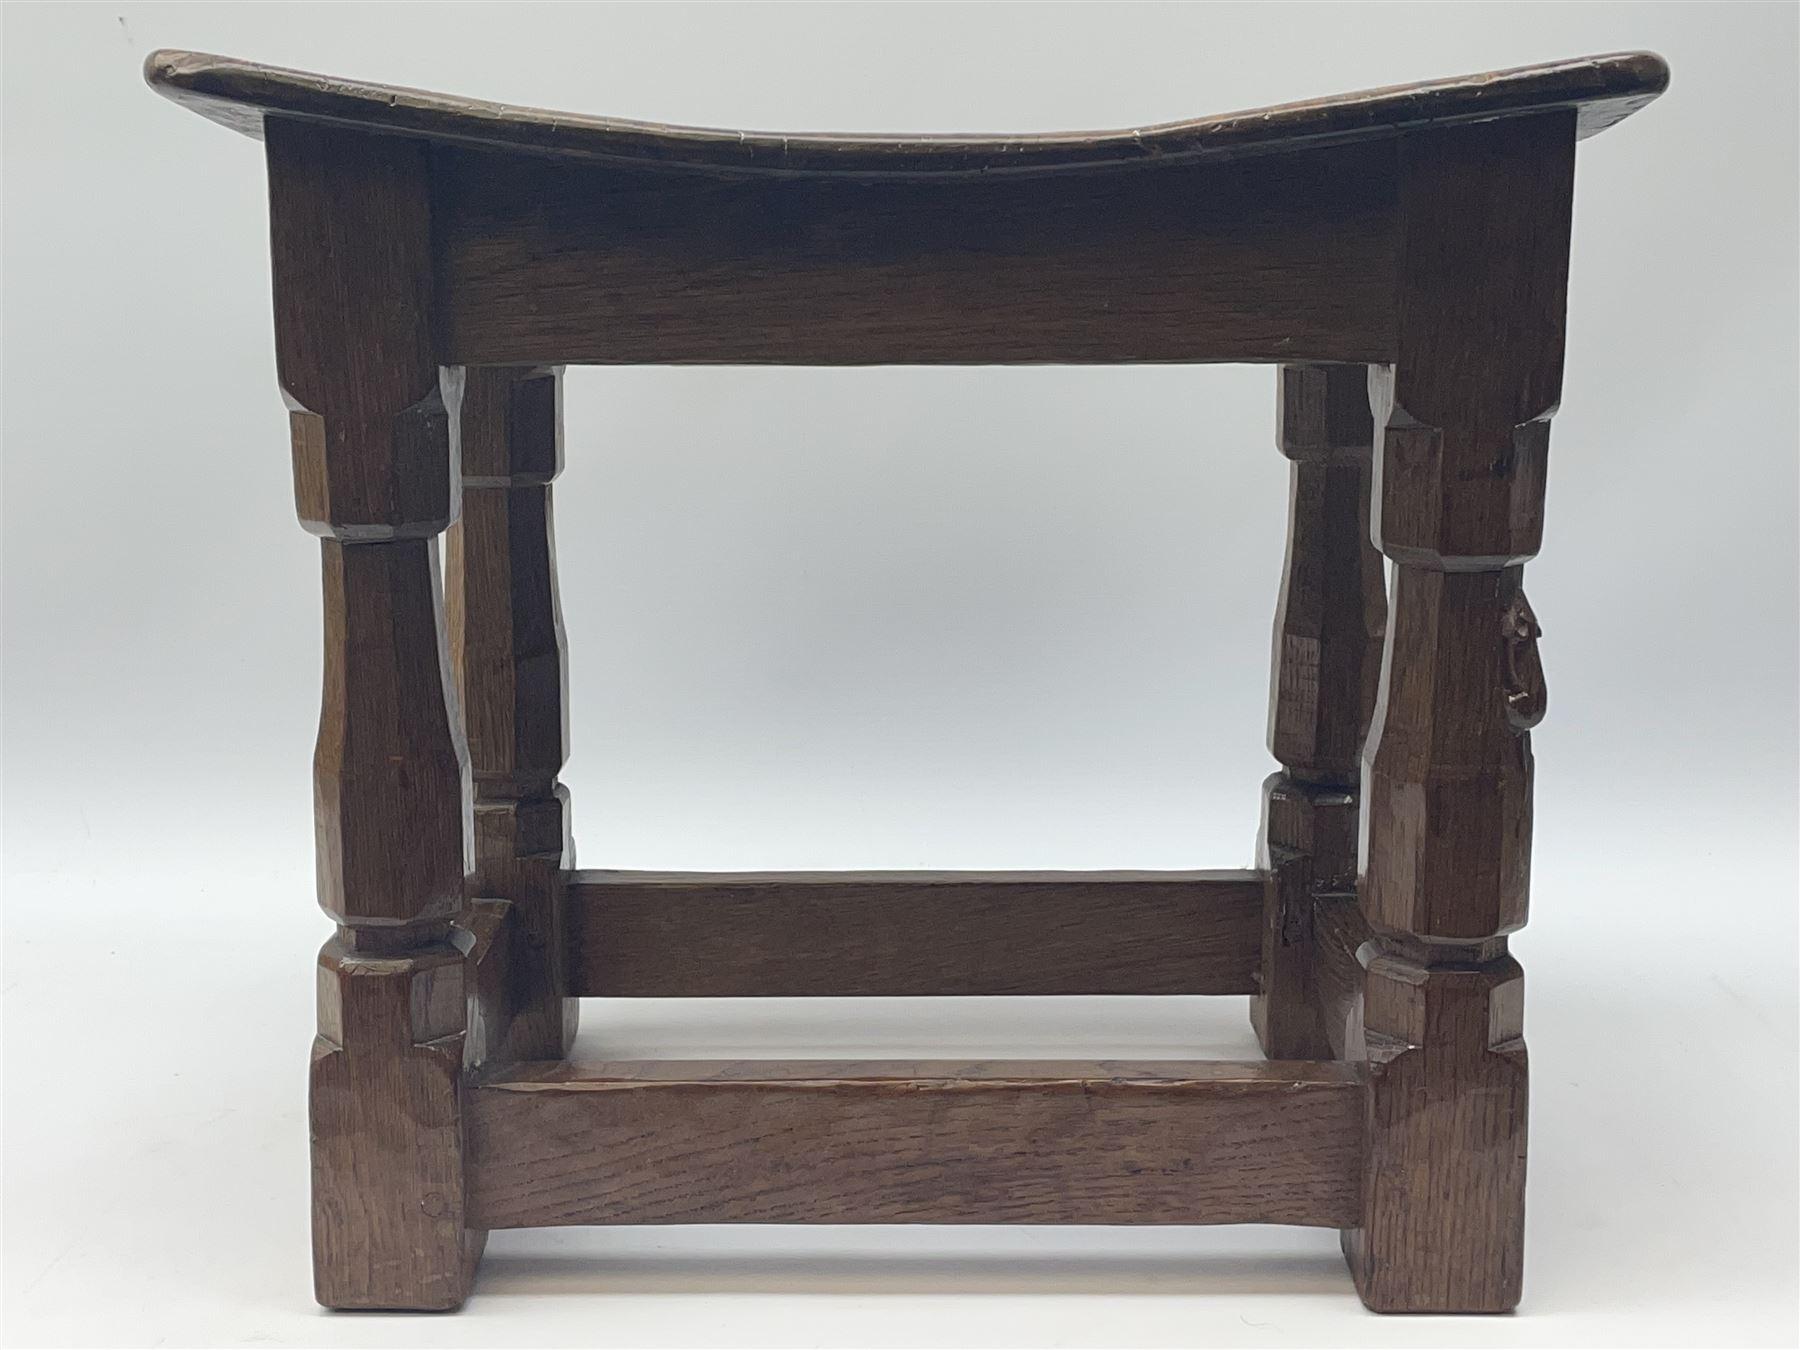 'Mouseman' 1940s adzed oak joint stool - Image 4 of 7